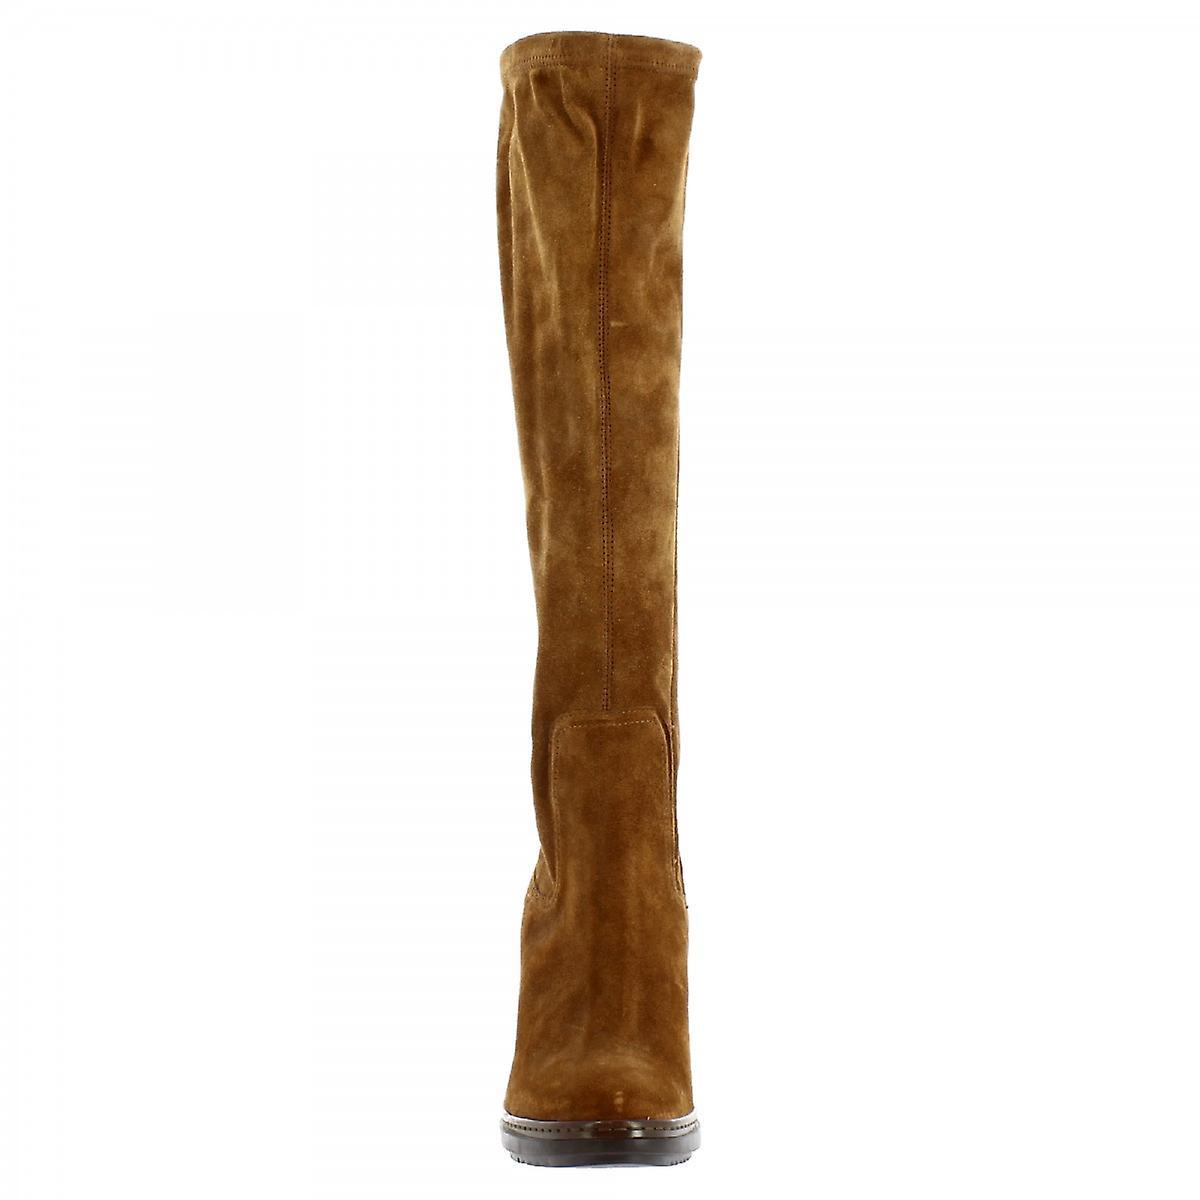 Leonardo Shoes Women's handmade heels knee high boots in tan suede leather 0OXUC